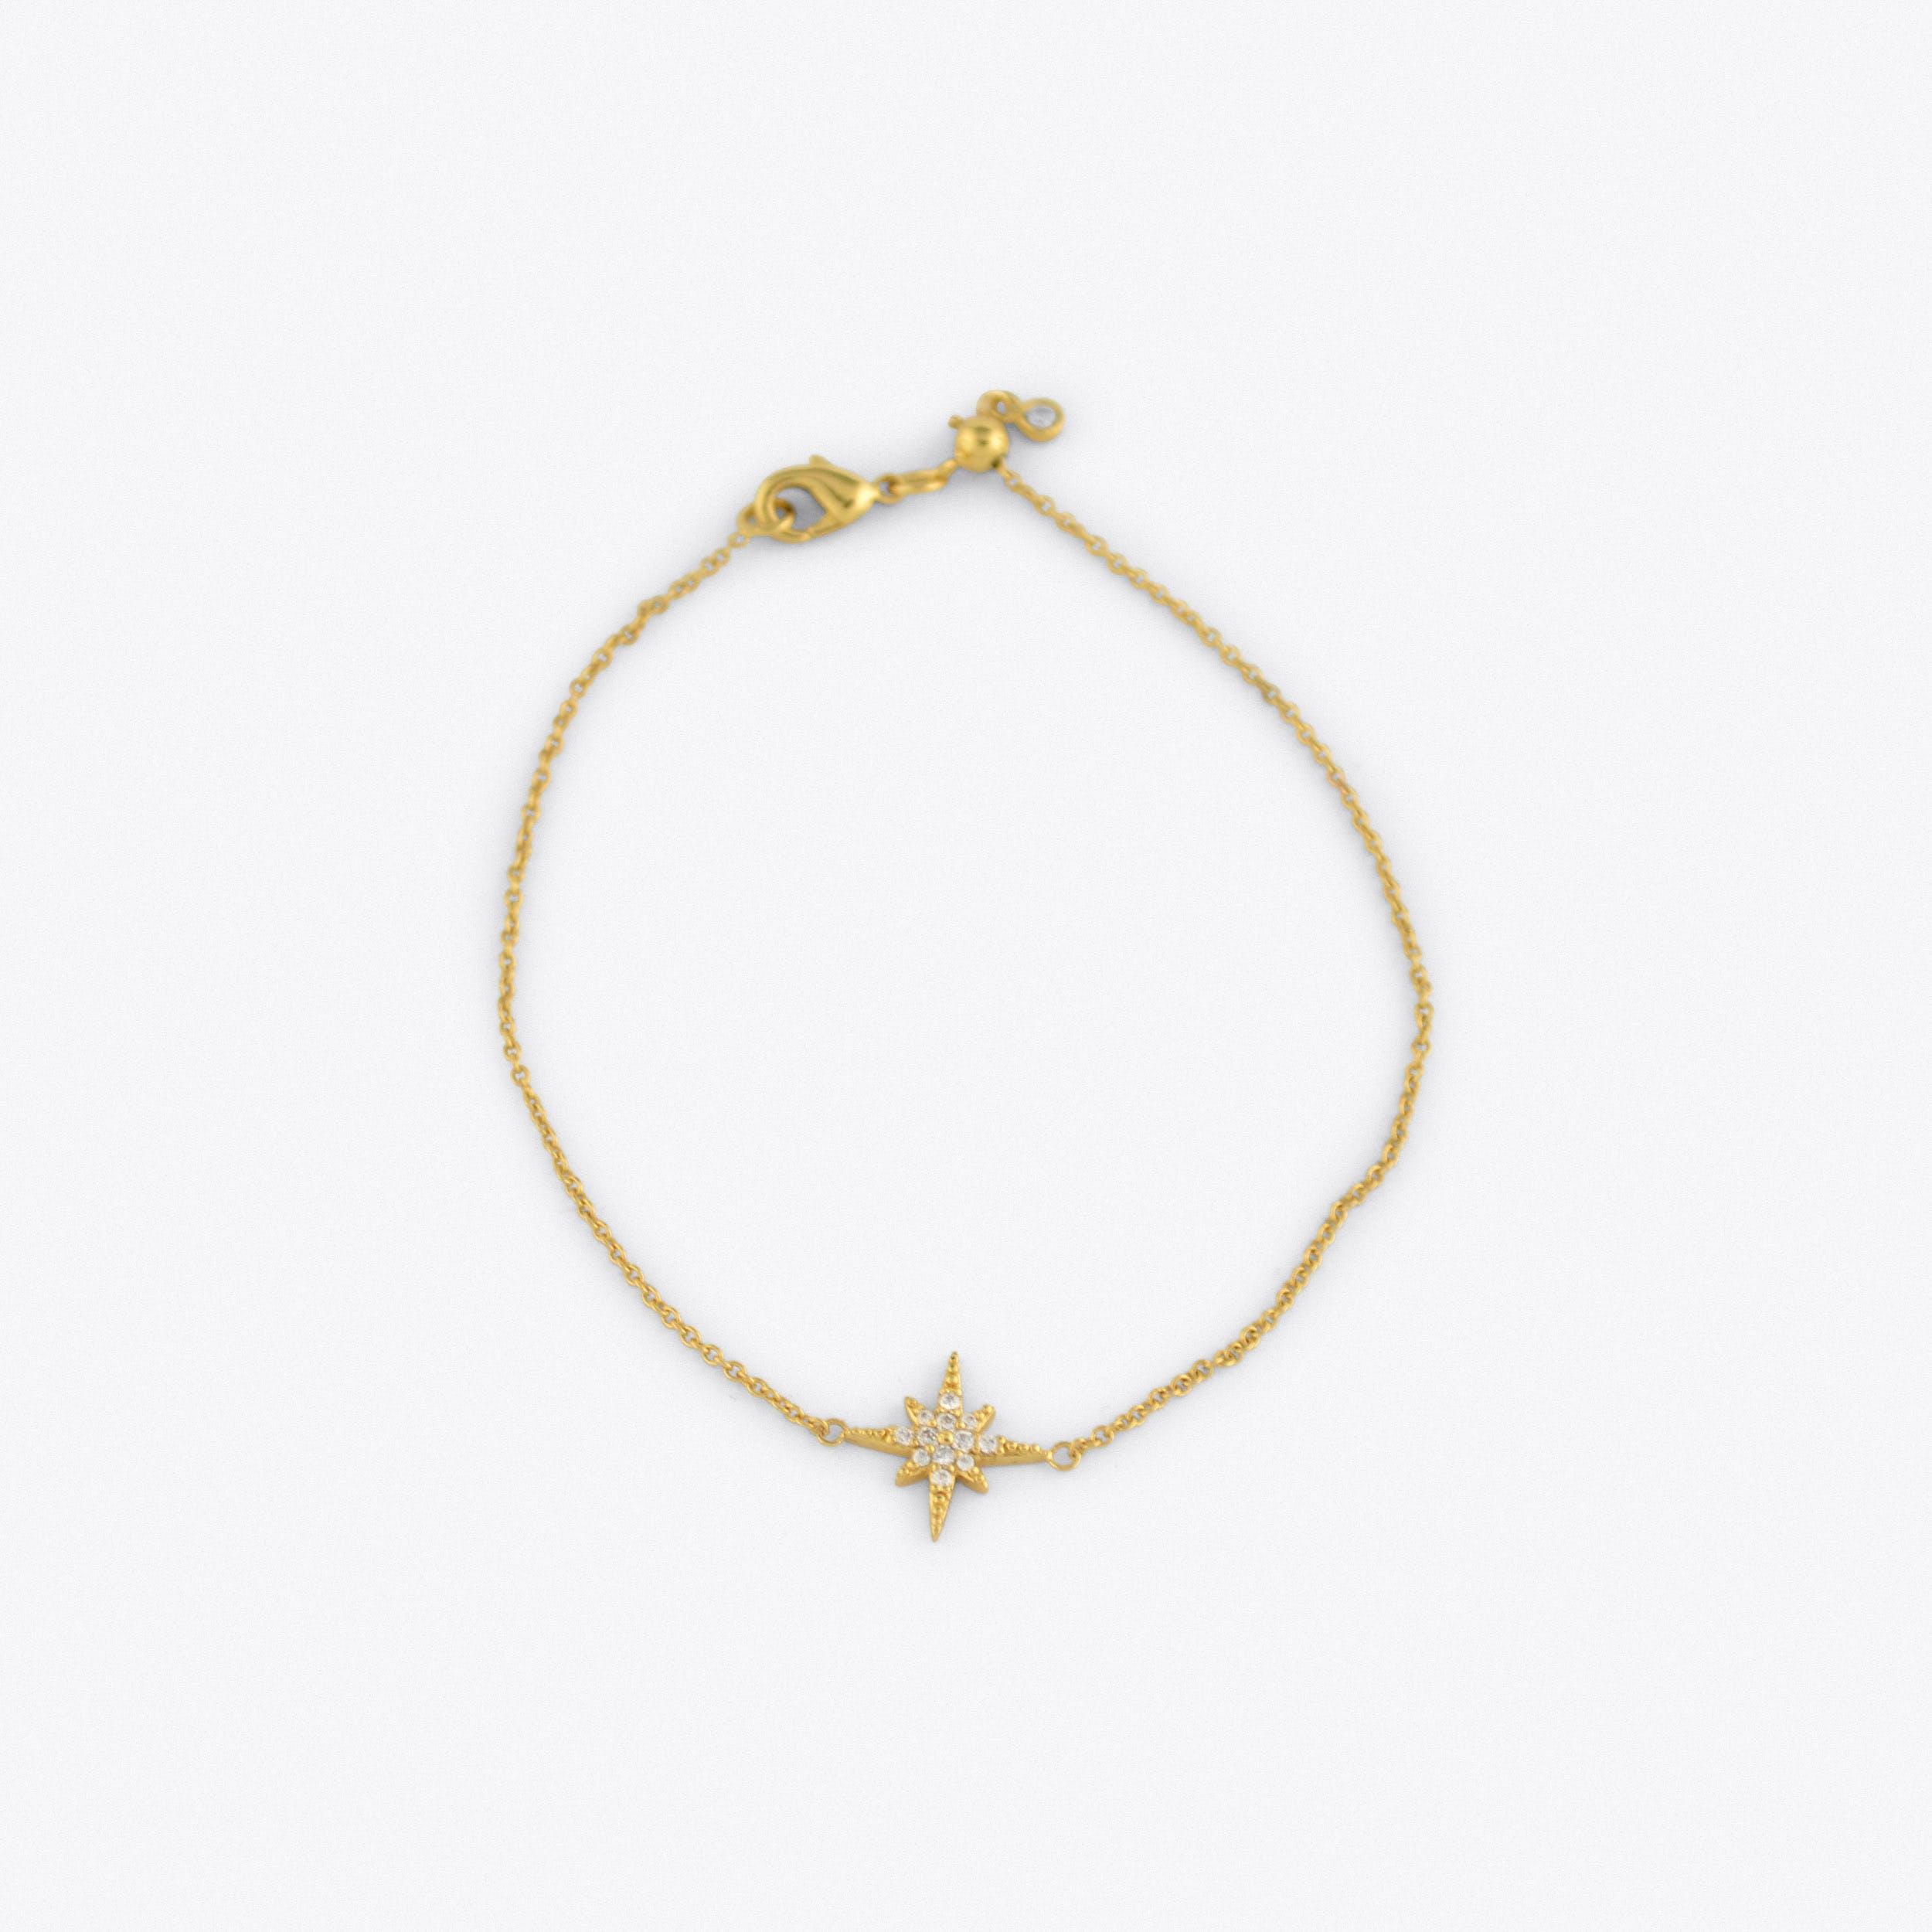 Starburst Bracelet with Slider Clasp in Gold